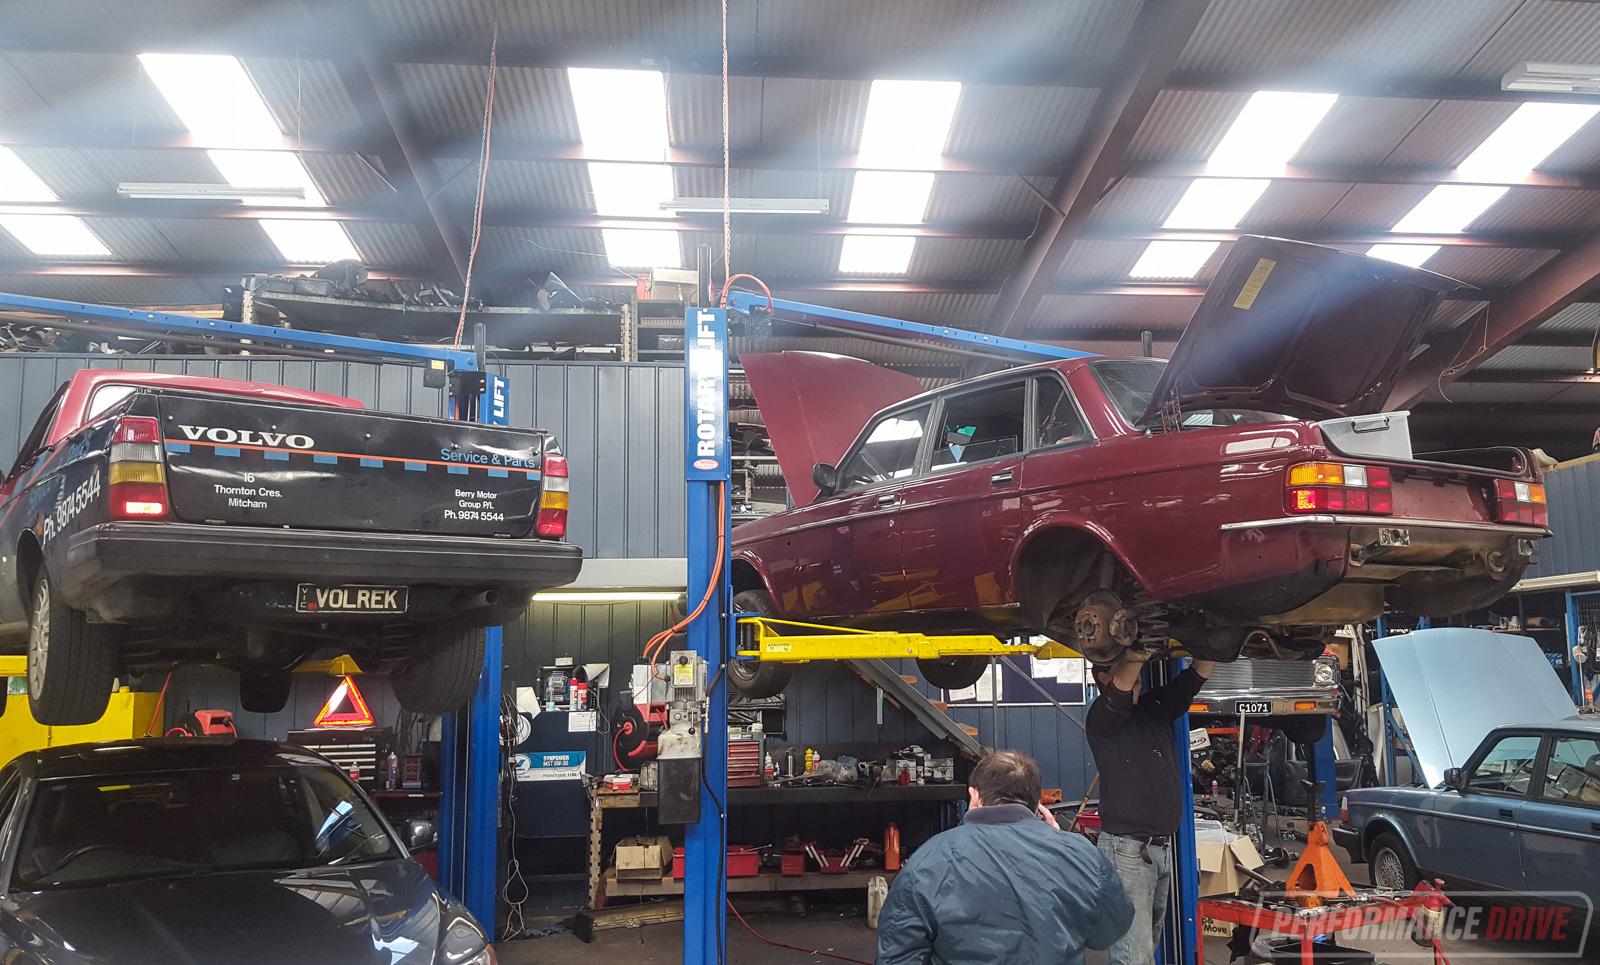 Volvo 240 GL LS1 V8 conversion project: Part 10 - reassemble